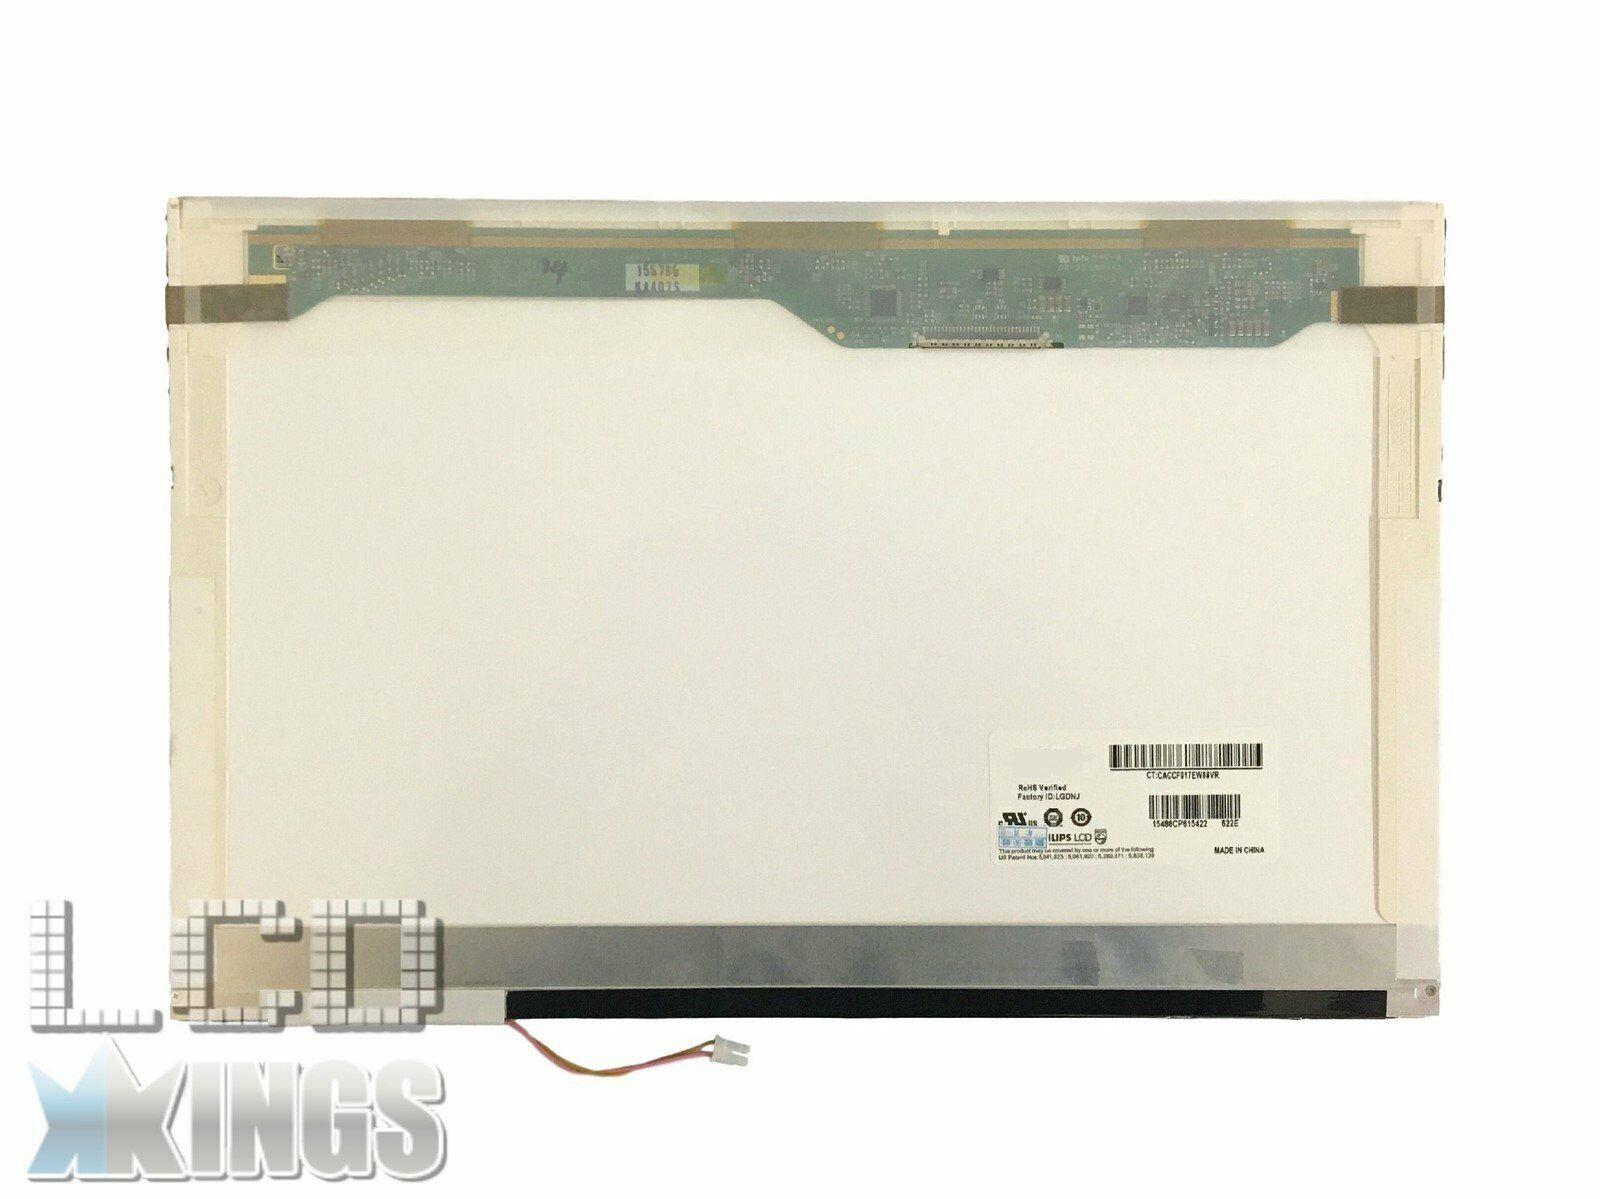 IBM Lenovo 42T0488 15.4